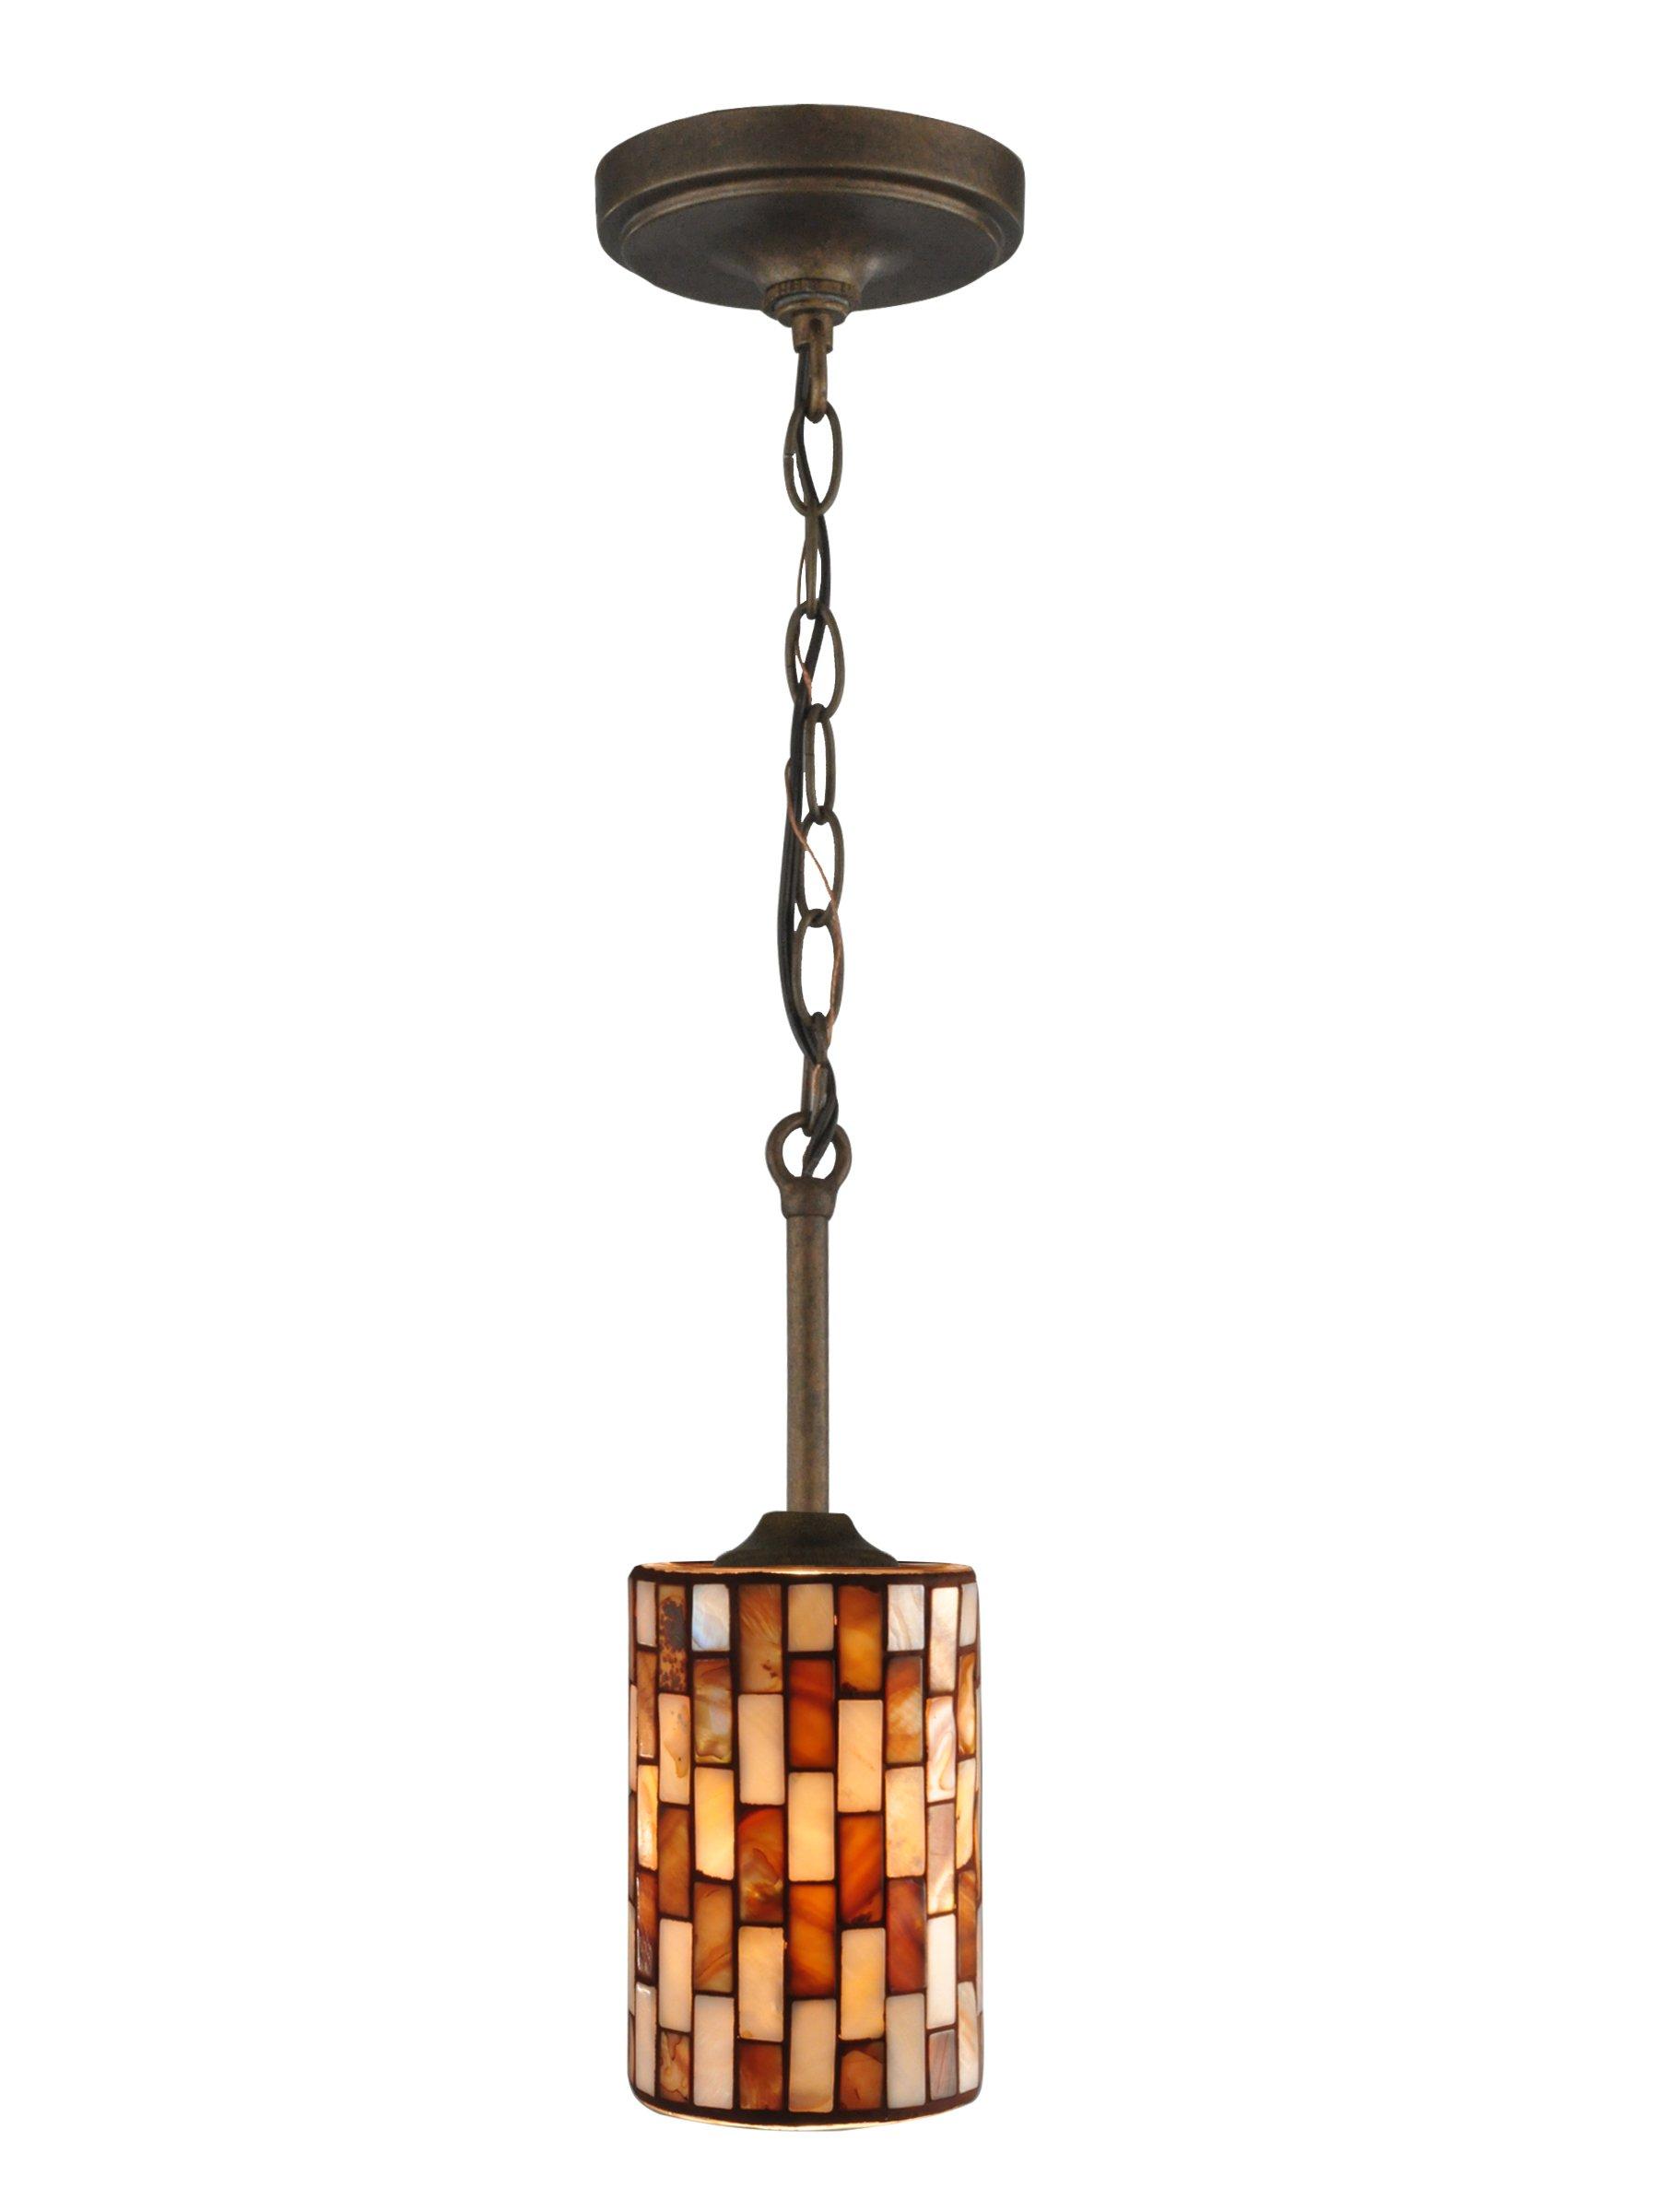 Springdale TH13318 Myraid Chain Mosaic Mini Pendant, Rustic Bronze